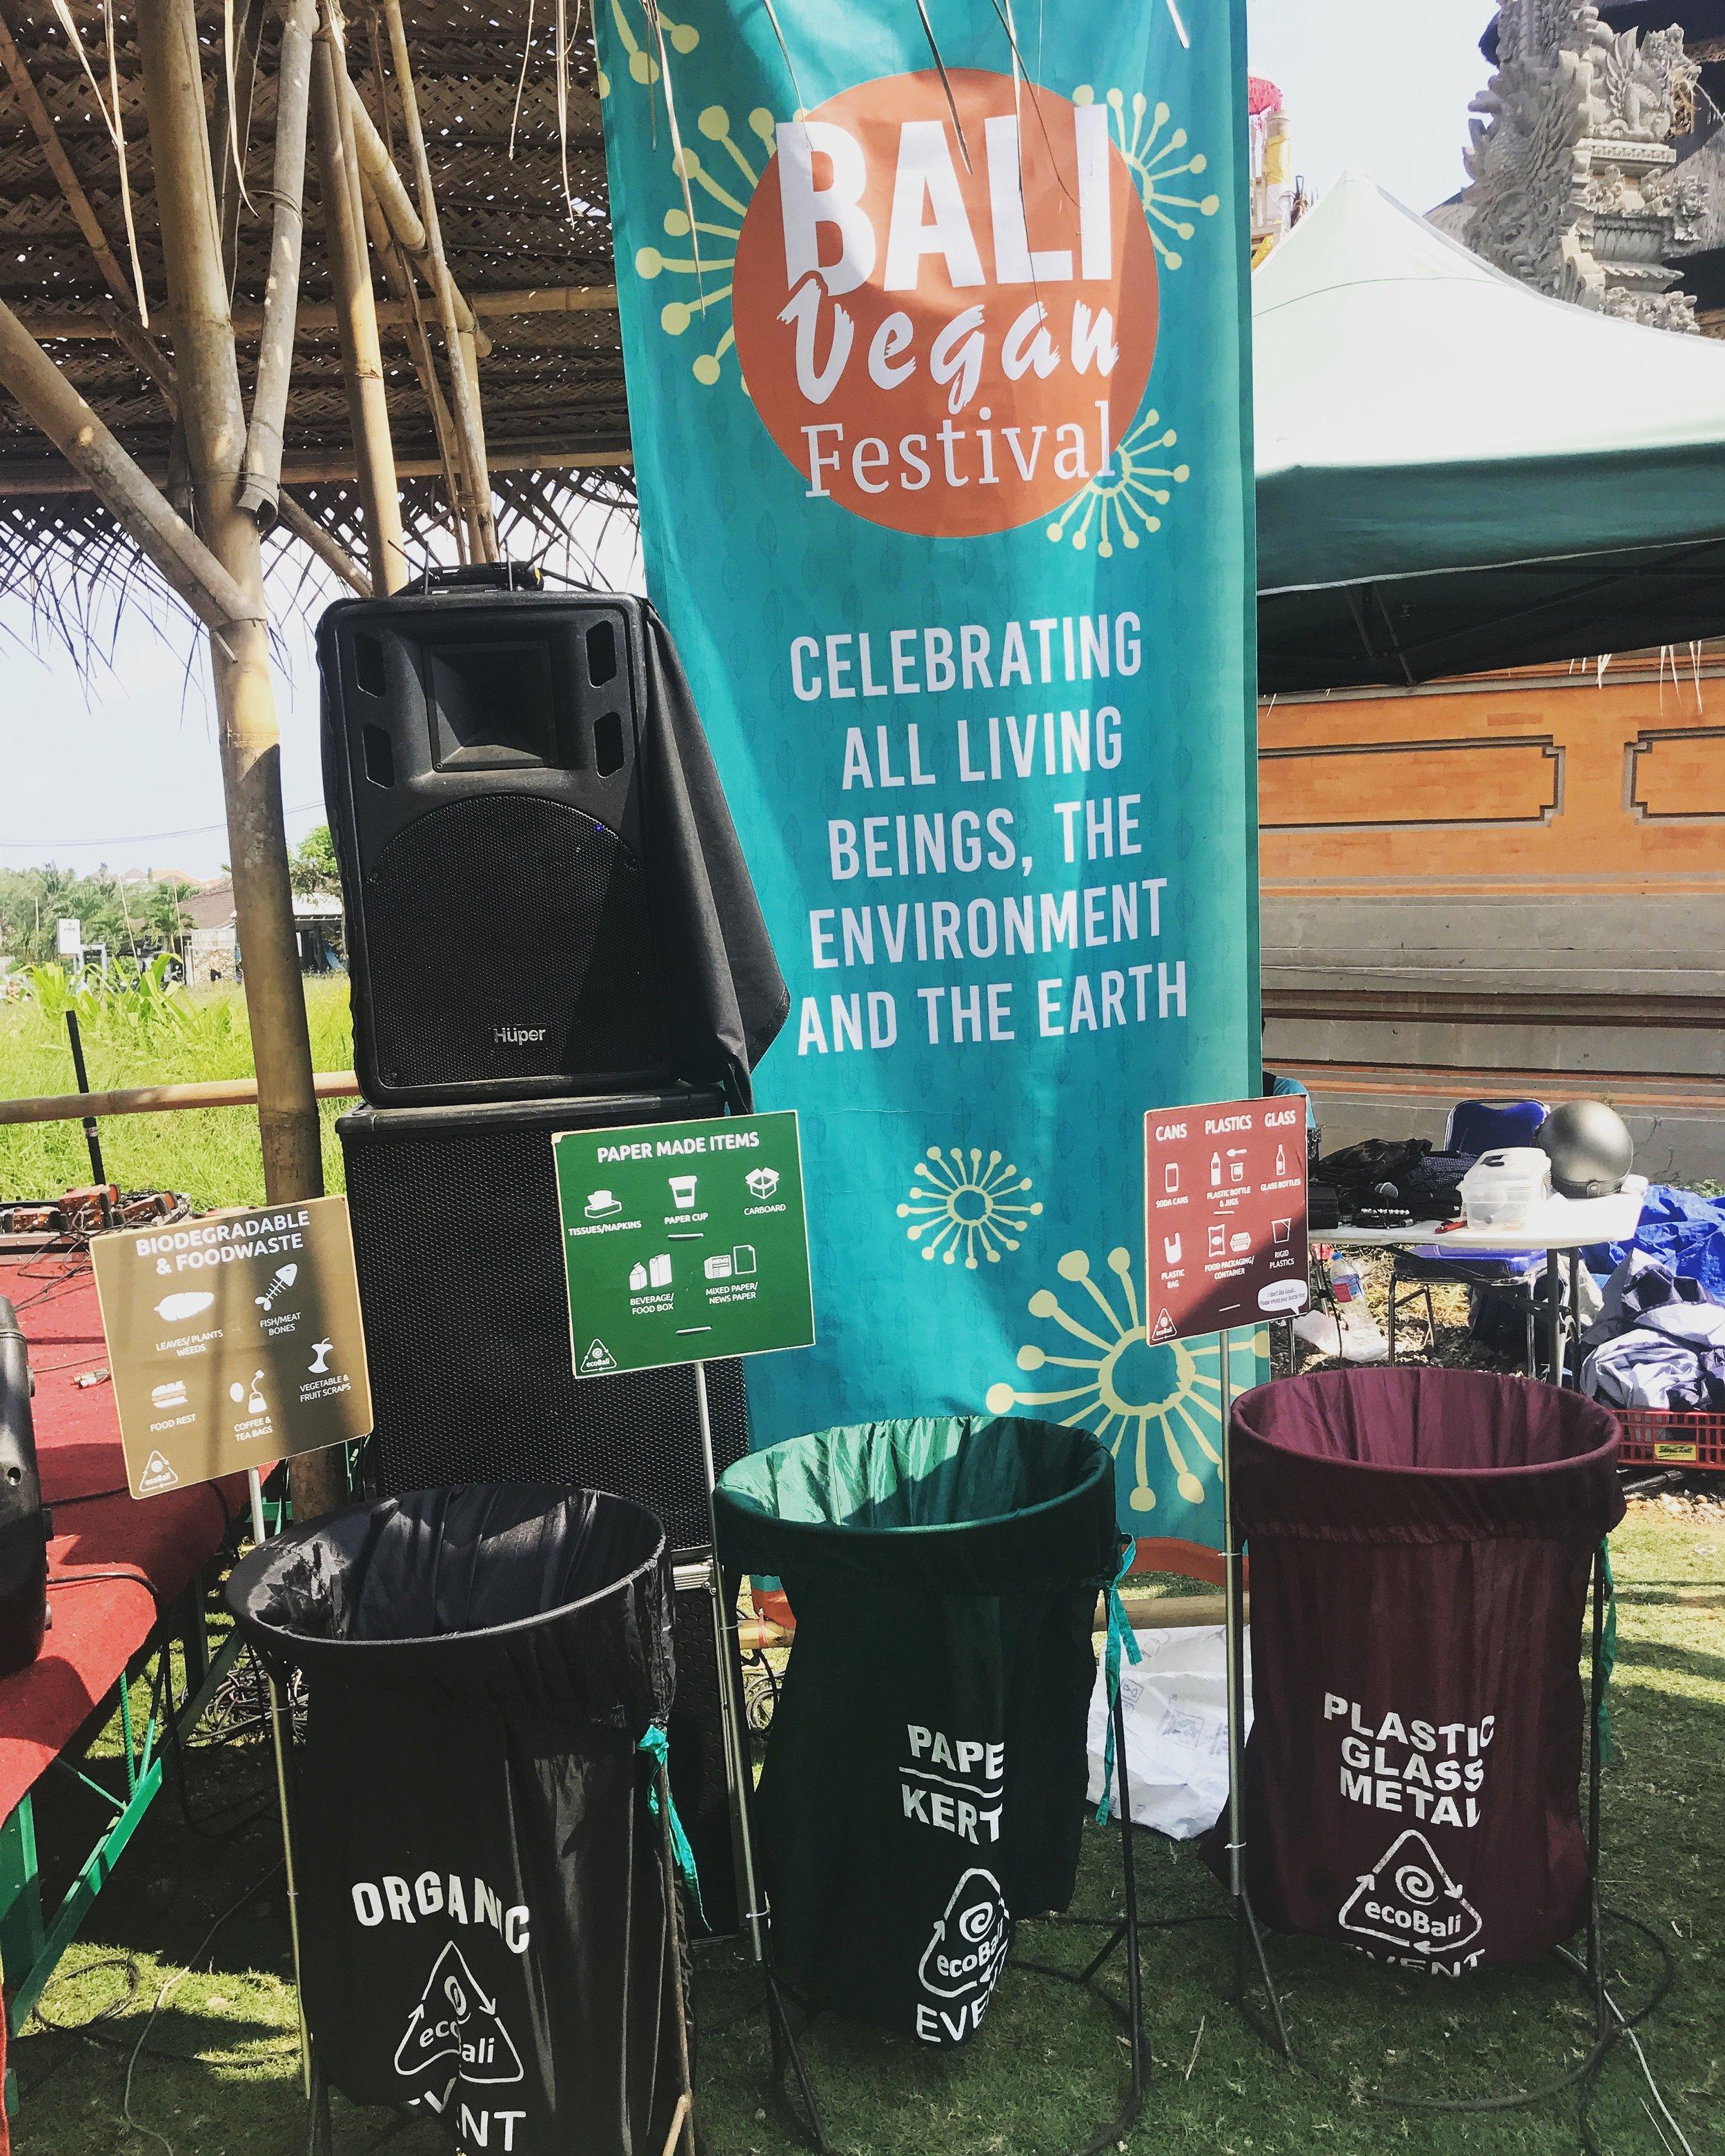 Bali Vegan Festival 2018